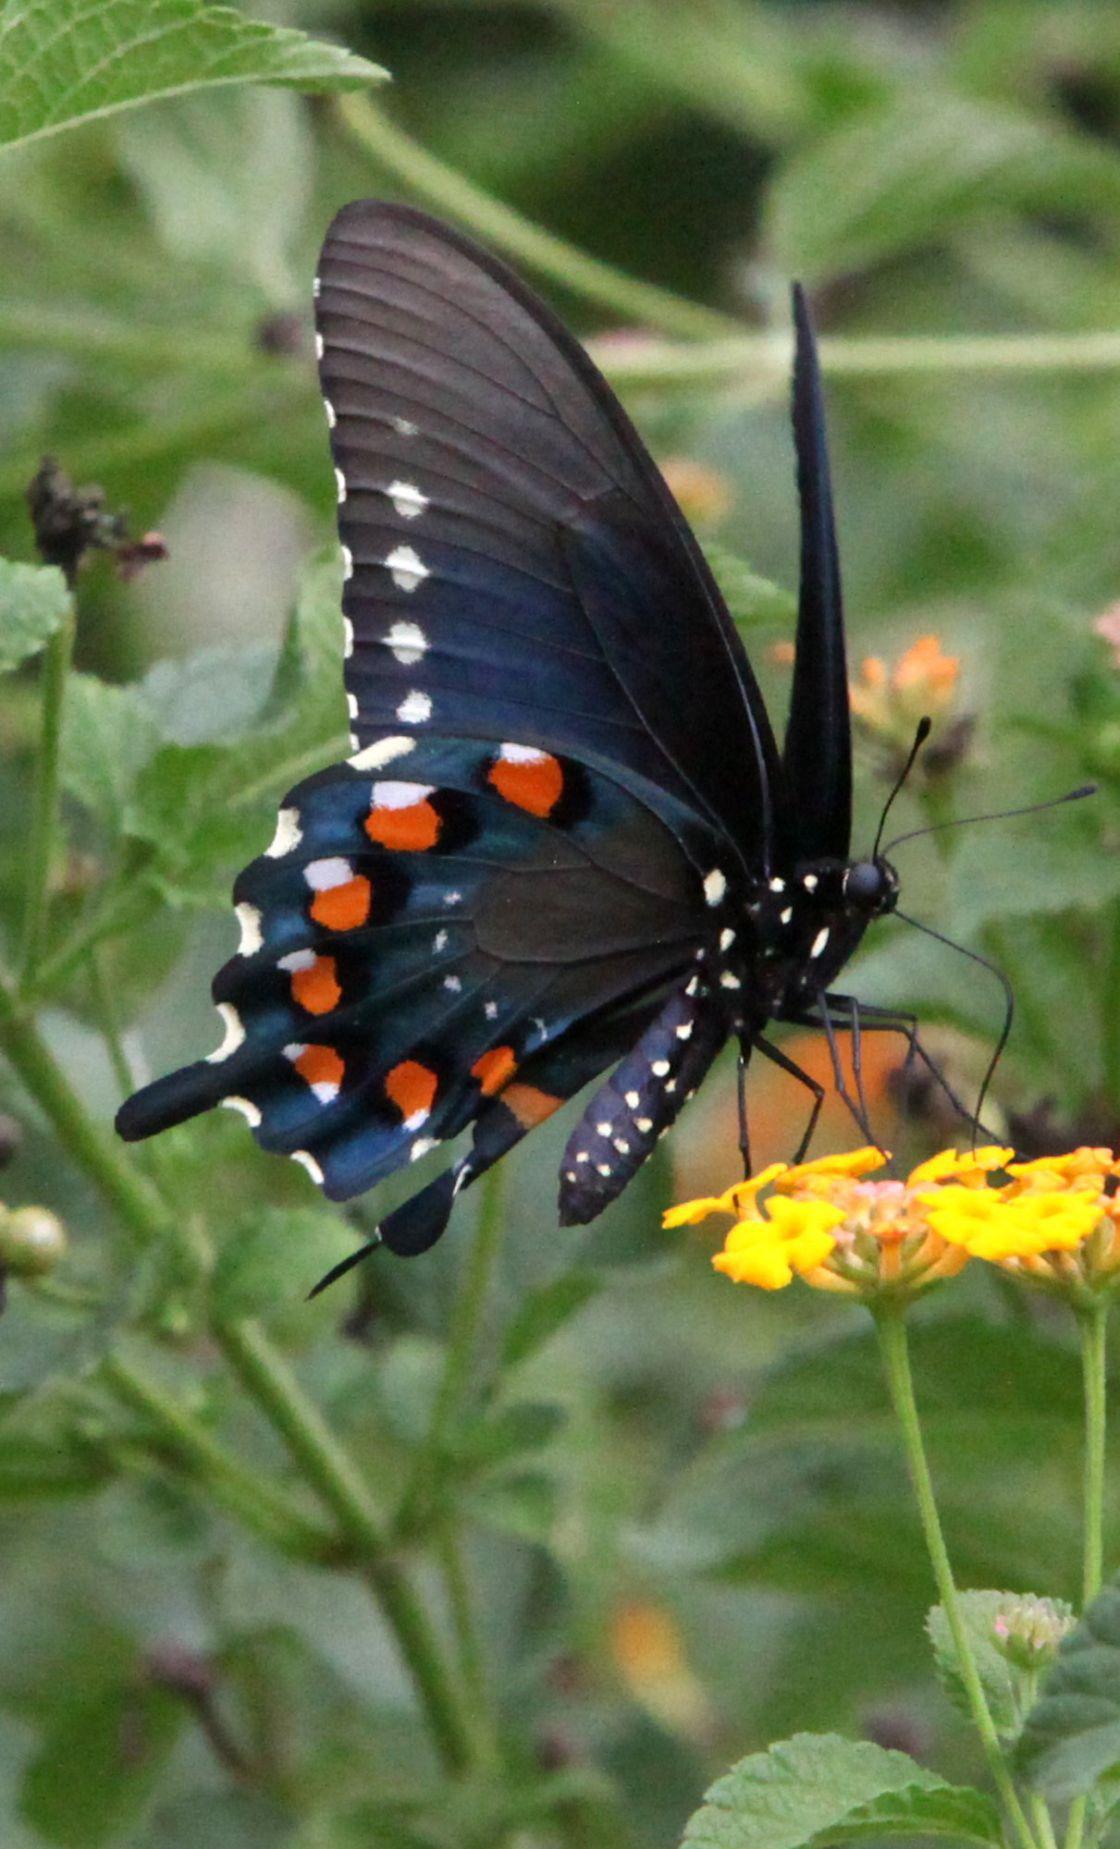 Pipevine Swallowtail |Pipevine Swallowtail Butterfly